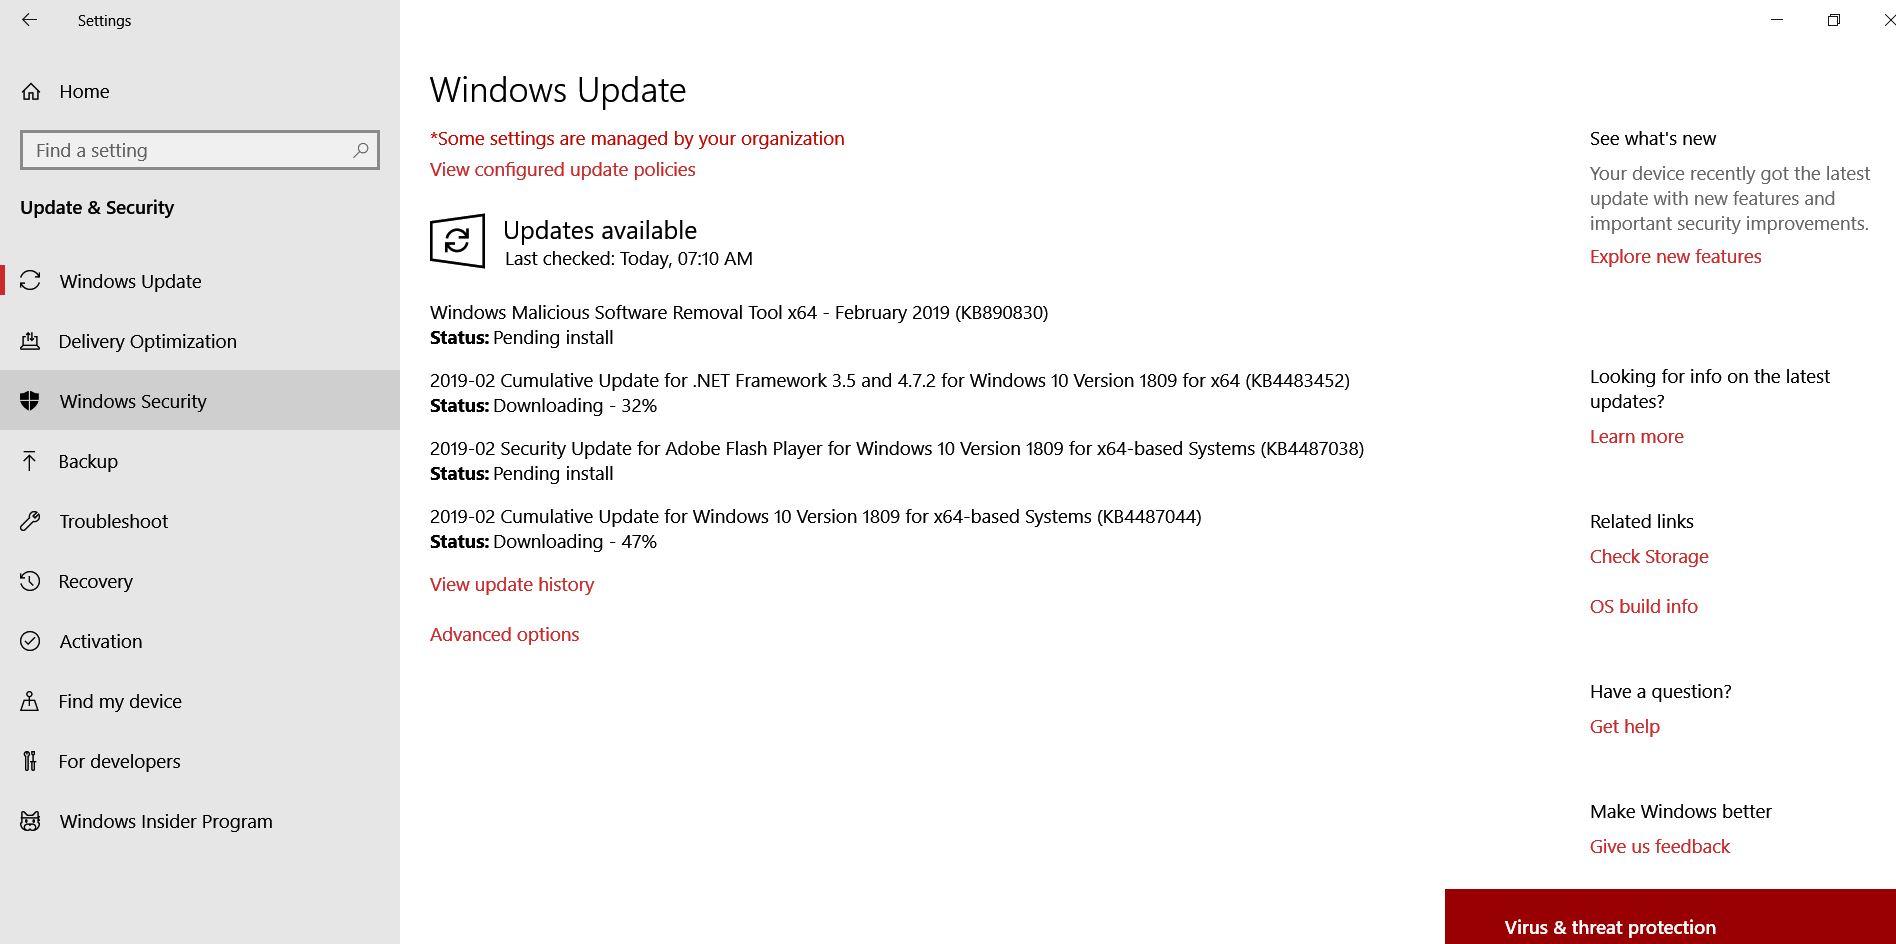 WINDOWS UPDATE RELEASED CLU KB4490481 TO WINDOWS 10 1809 AND WINDOWS SERVER 2019 ON 02-04-2019 904cbe68-4cf6-4fdd-9fd5-7c67dff4cc98?upload=true.jpg